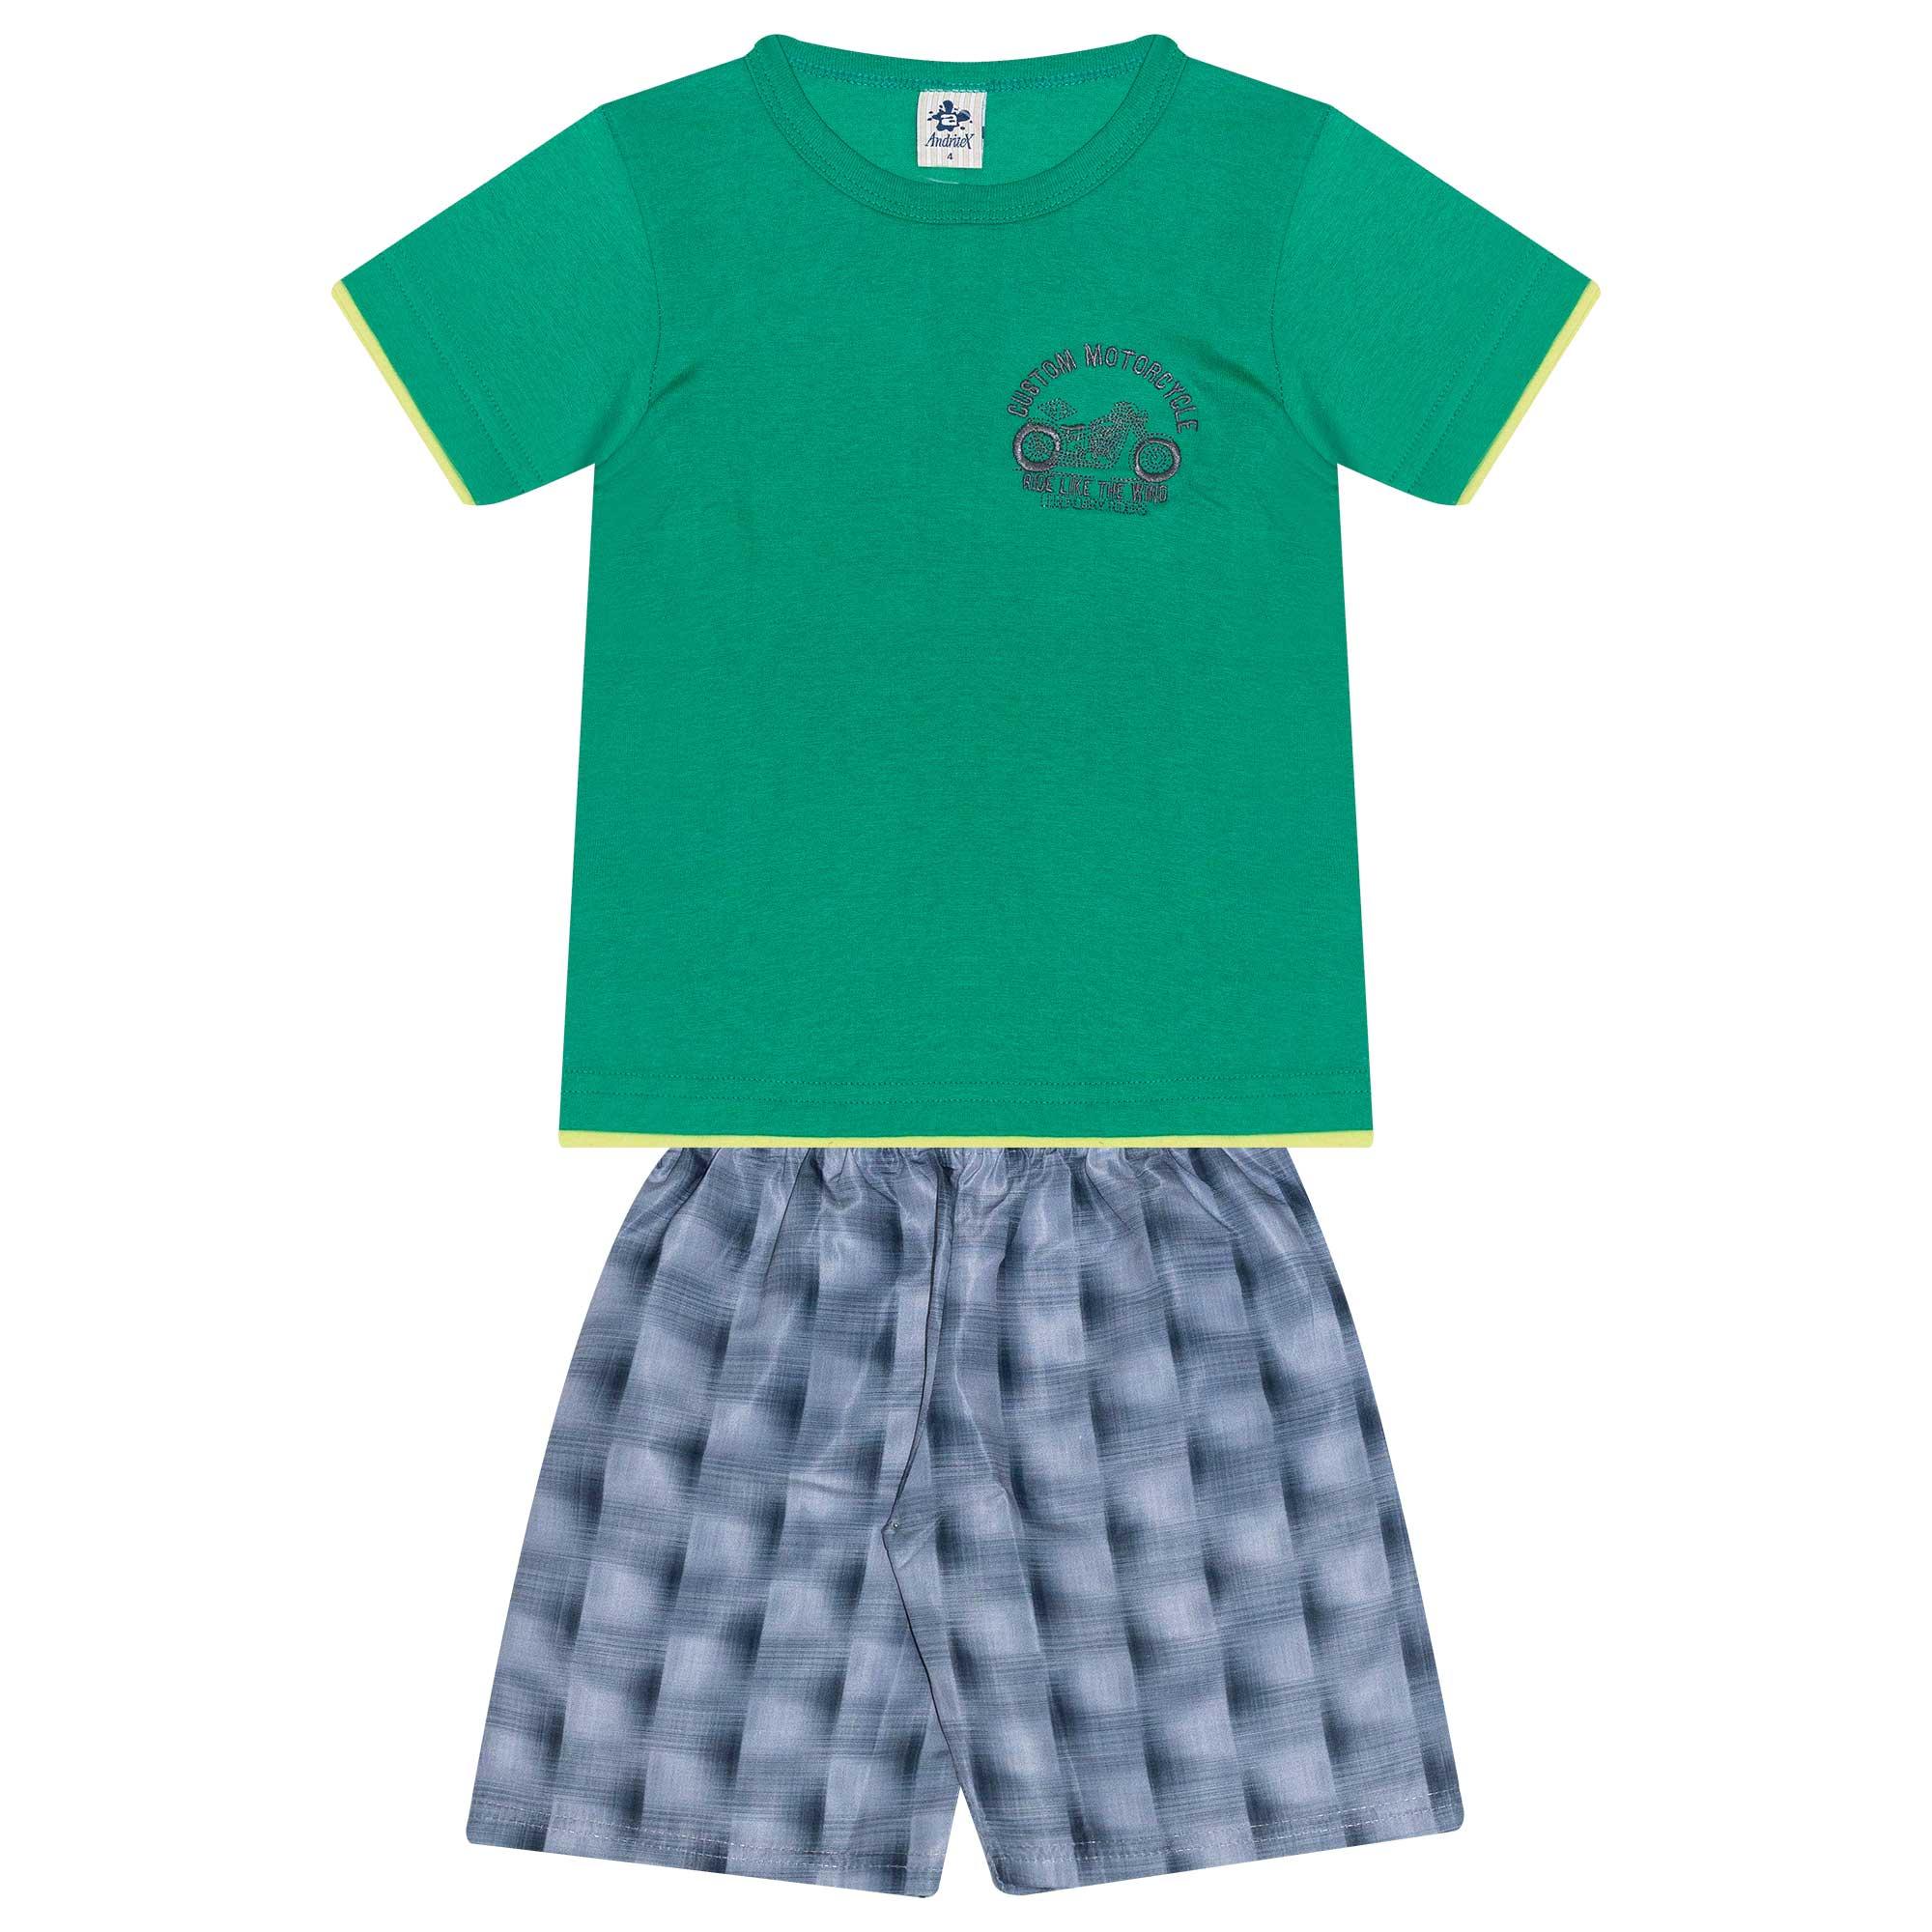 Conjunto Infantil Masculino - Ref 4778  - Verde - Andritex